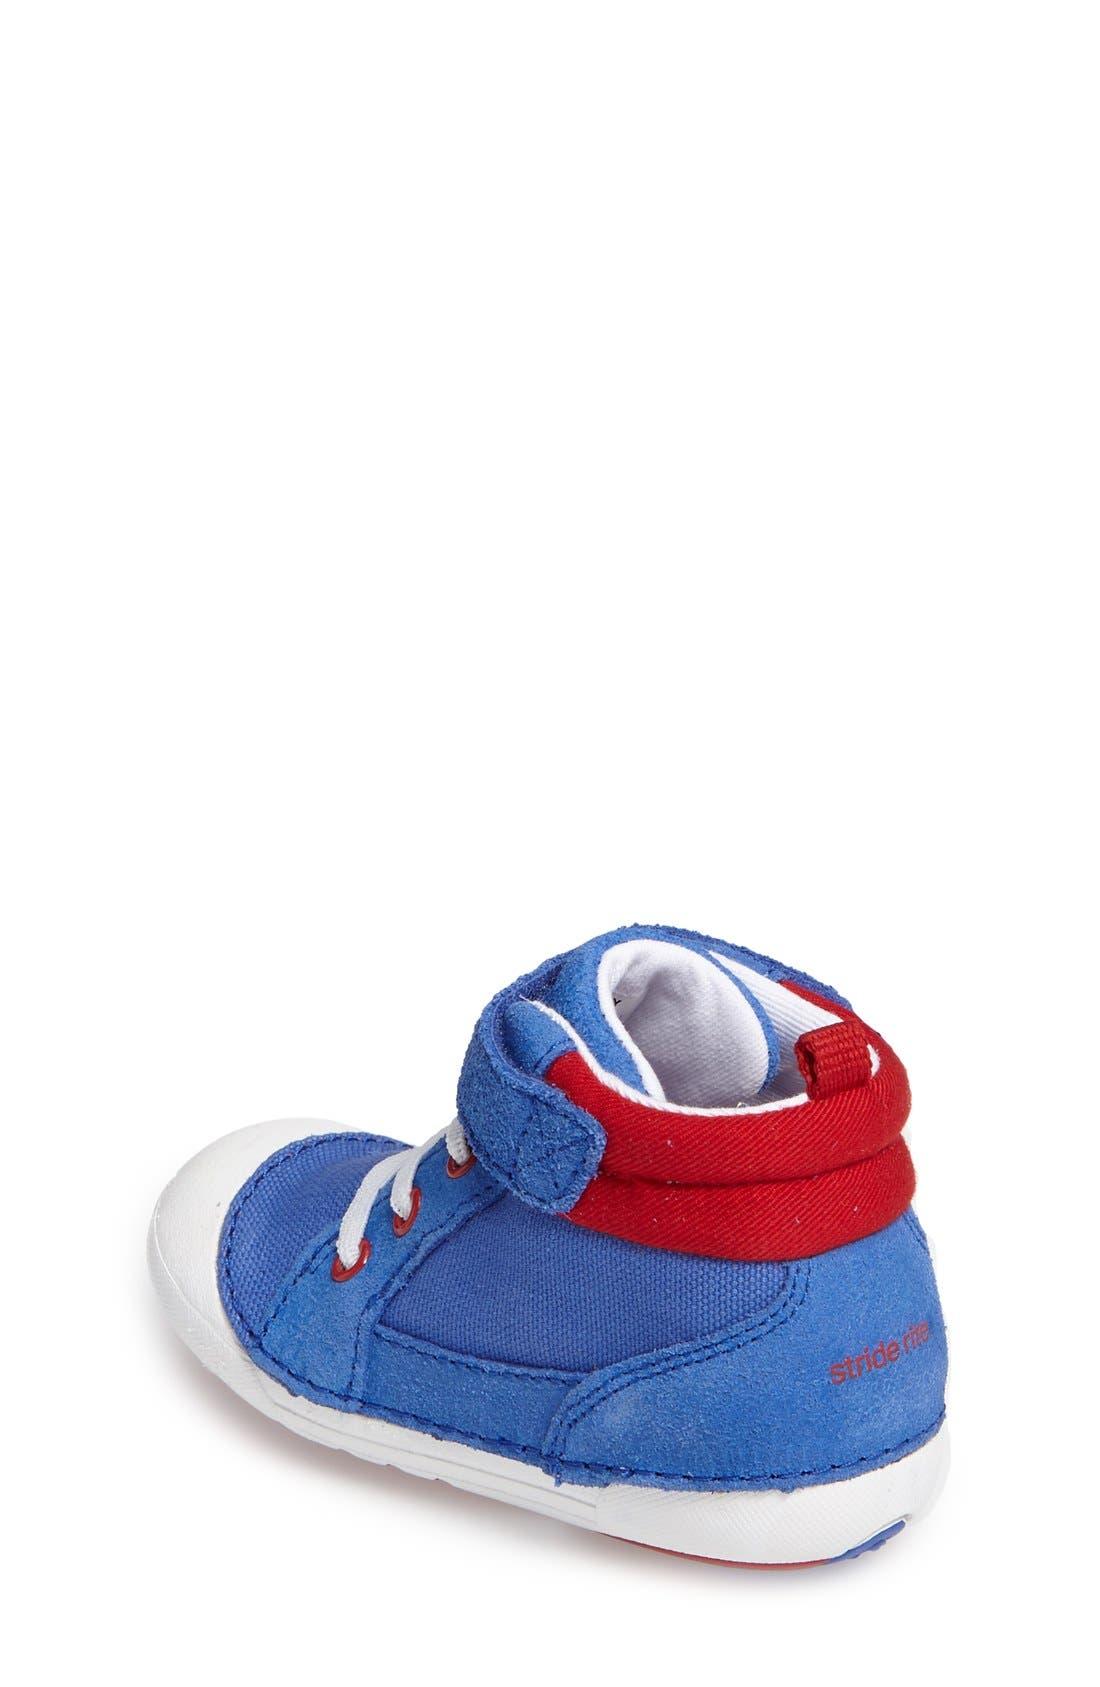 Soft Motion Danny Sneaker,                             Alternate thumbnail 22, color,